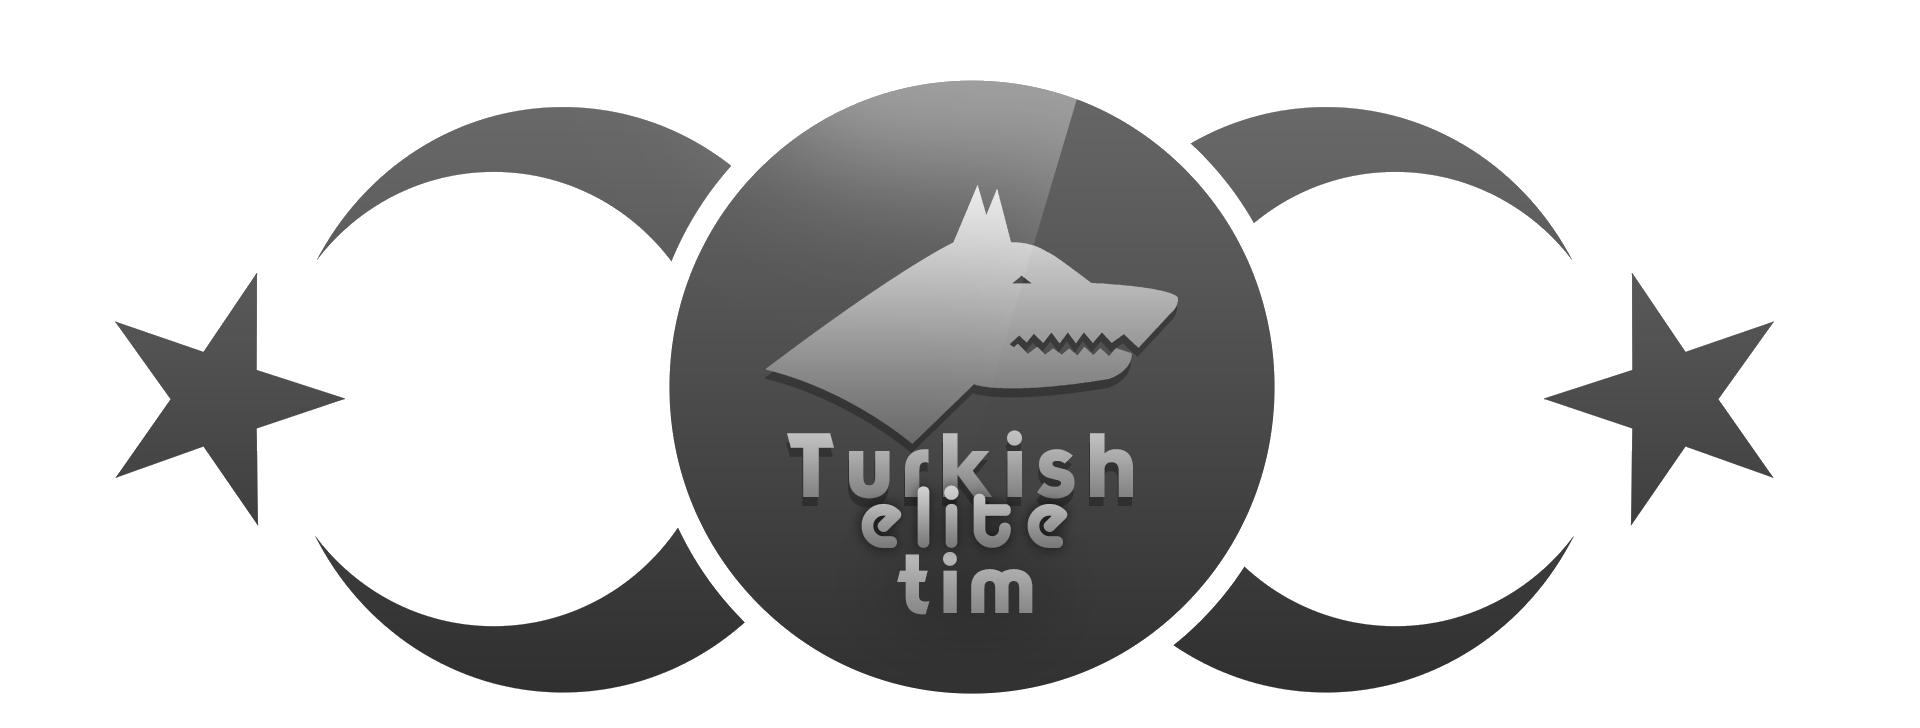 TurkishEliteTim